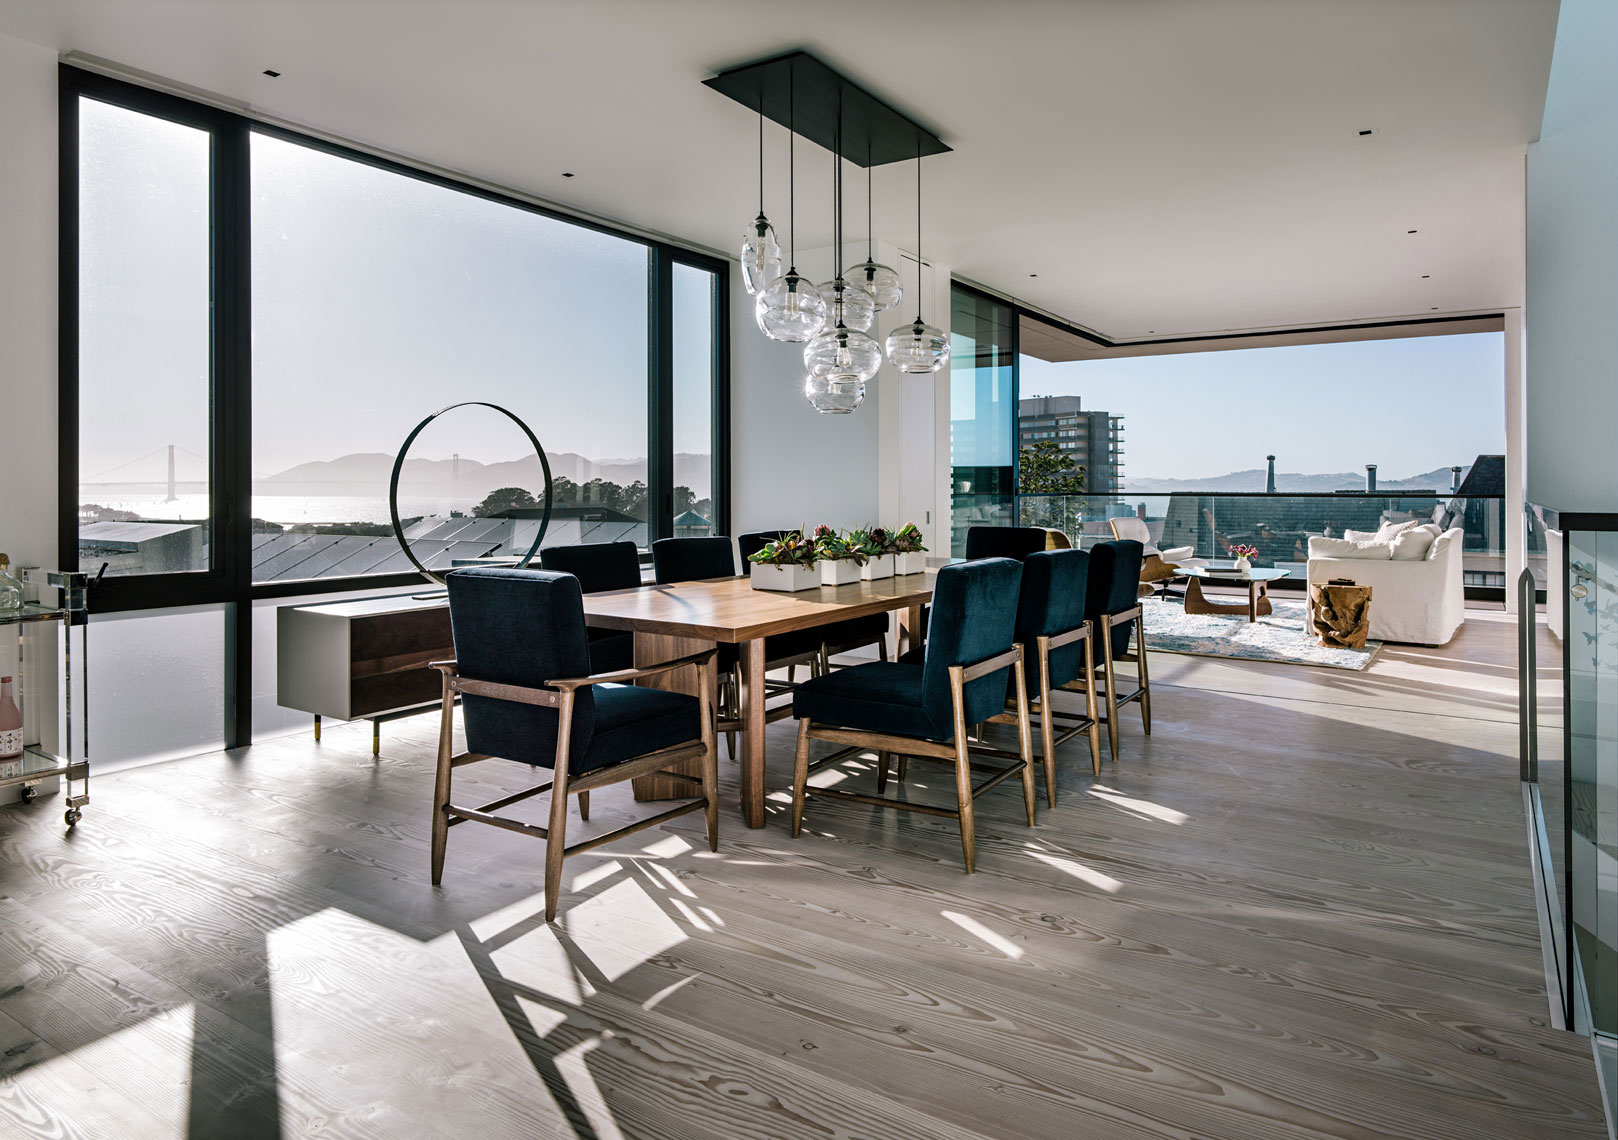 John Maniscalco Architecture Designs an Elegant Contemporary Home ...